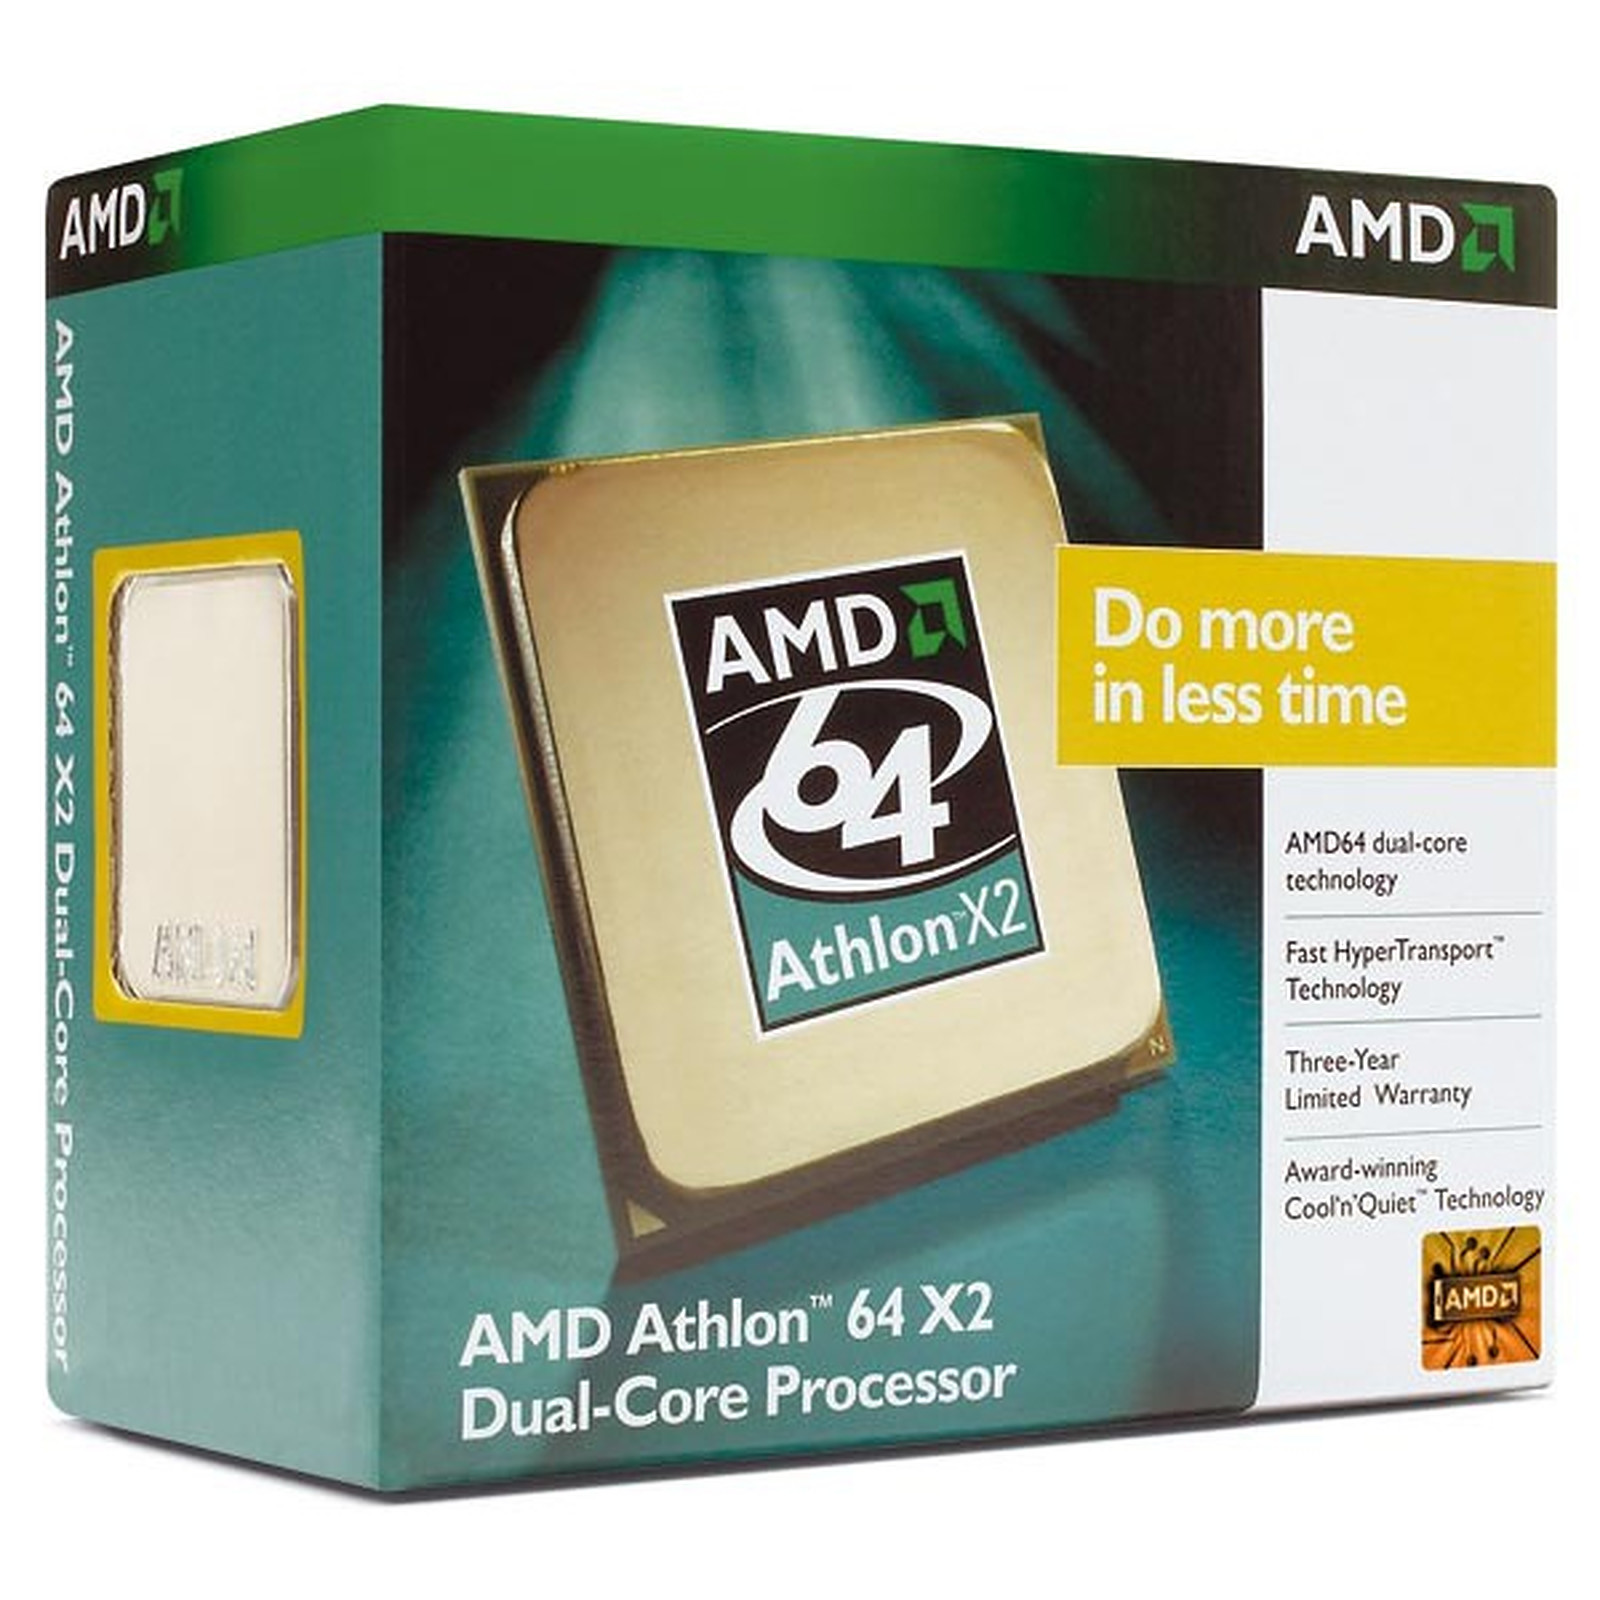 AMD Athlon 64 X2 Dual-Core 4200+